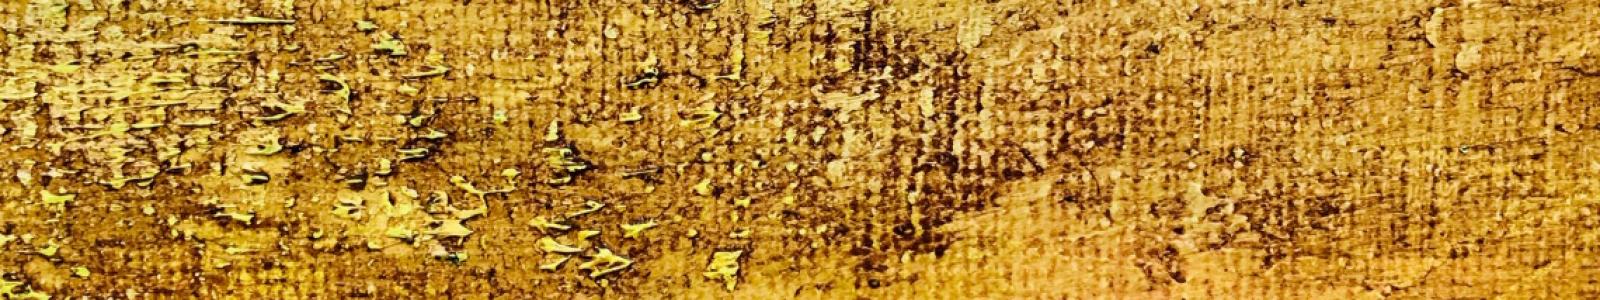 Gallery Painter svetlana Machailova